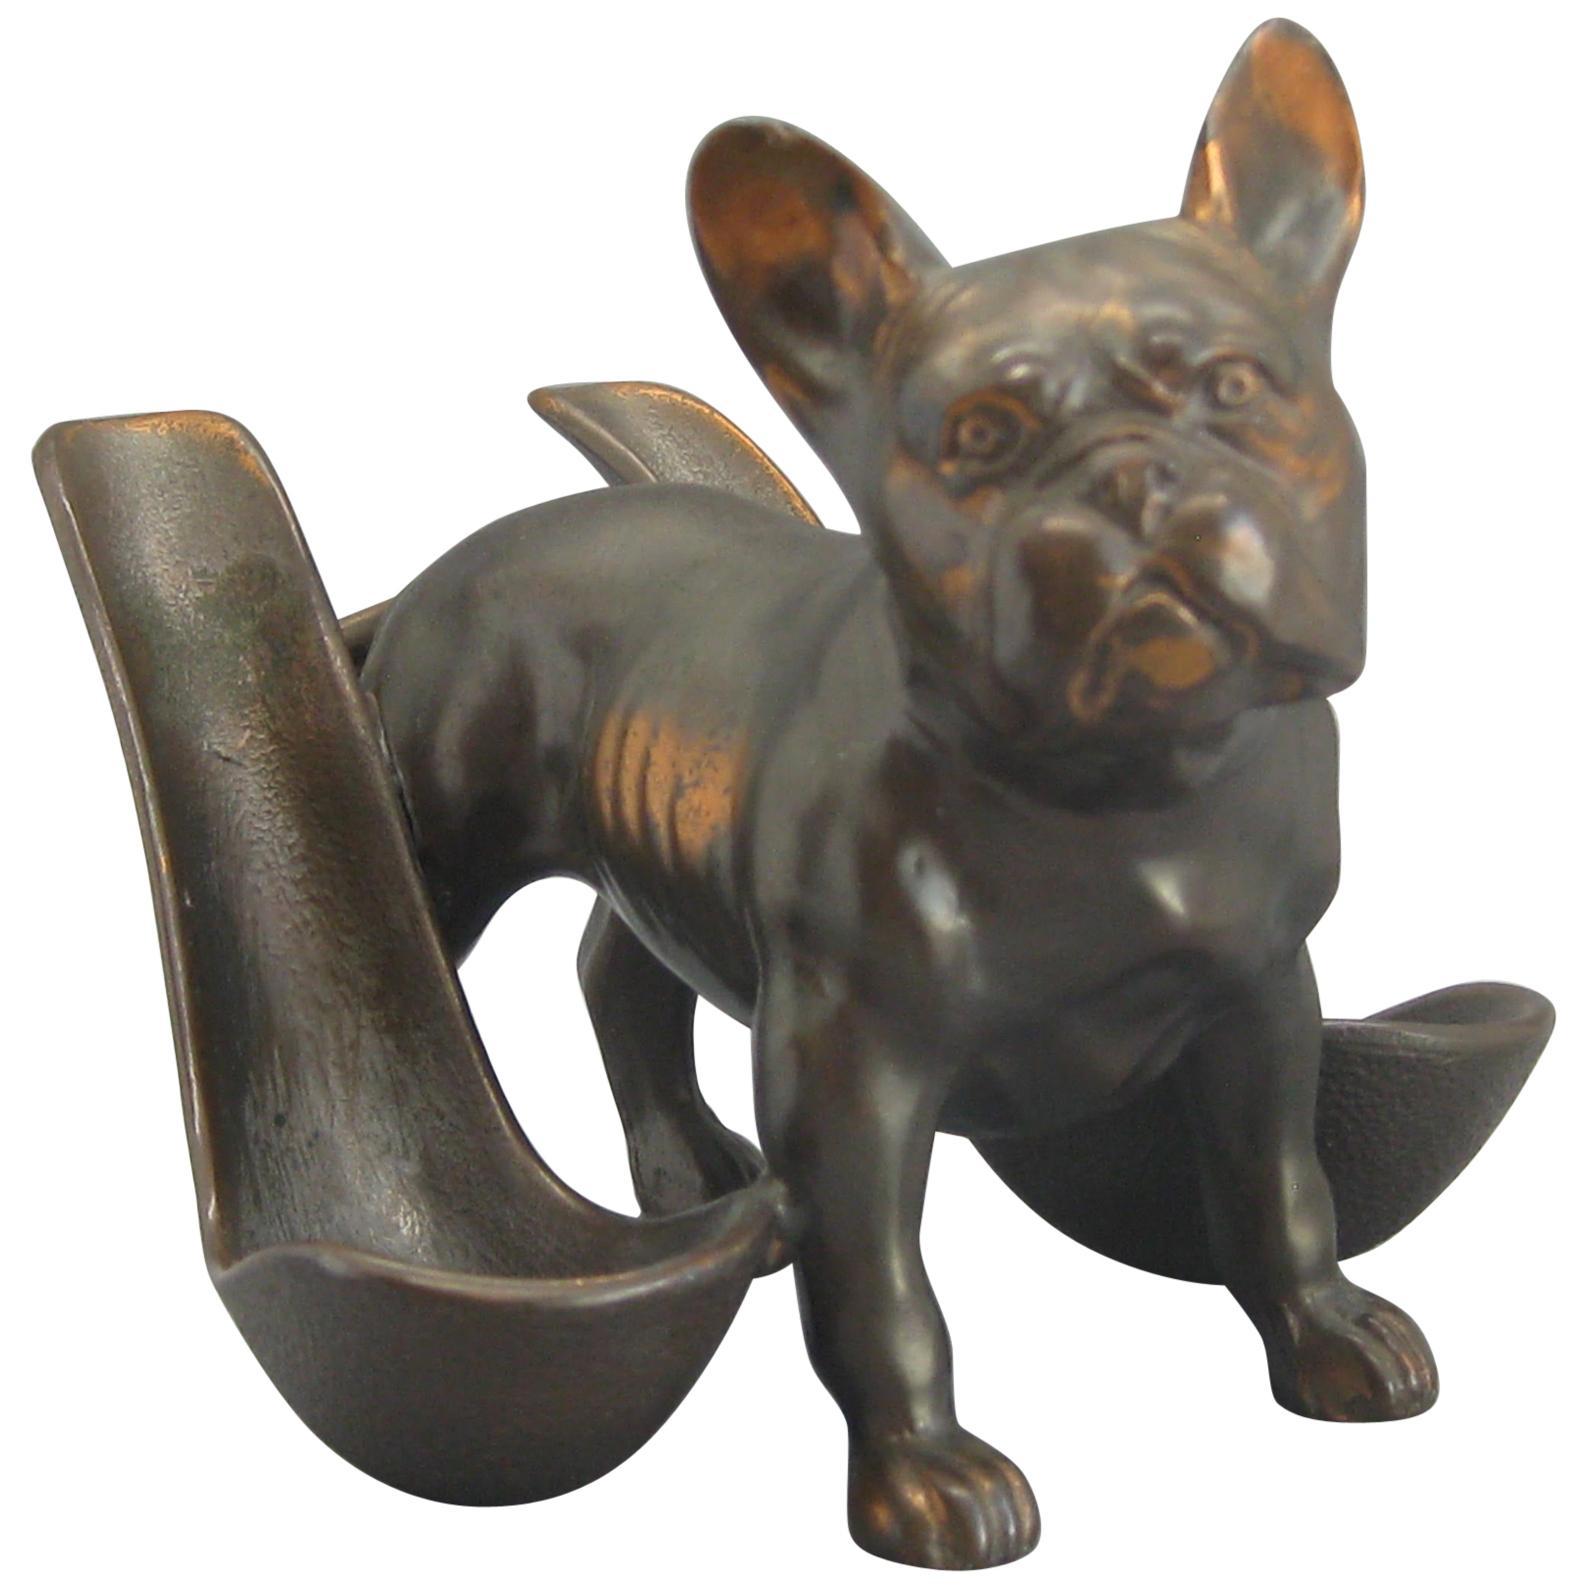 Antique French Bulldog Figural Dog Bronze Pipe Holder Stand Statue Sculpture